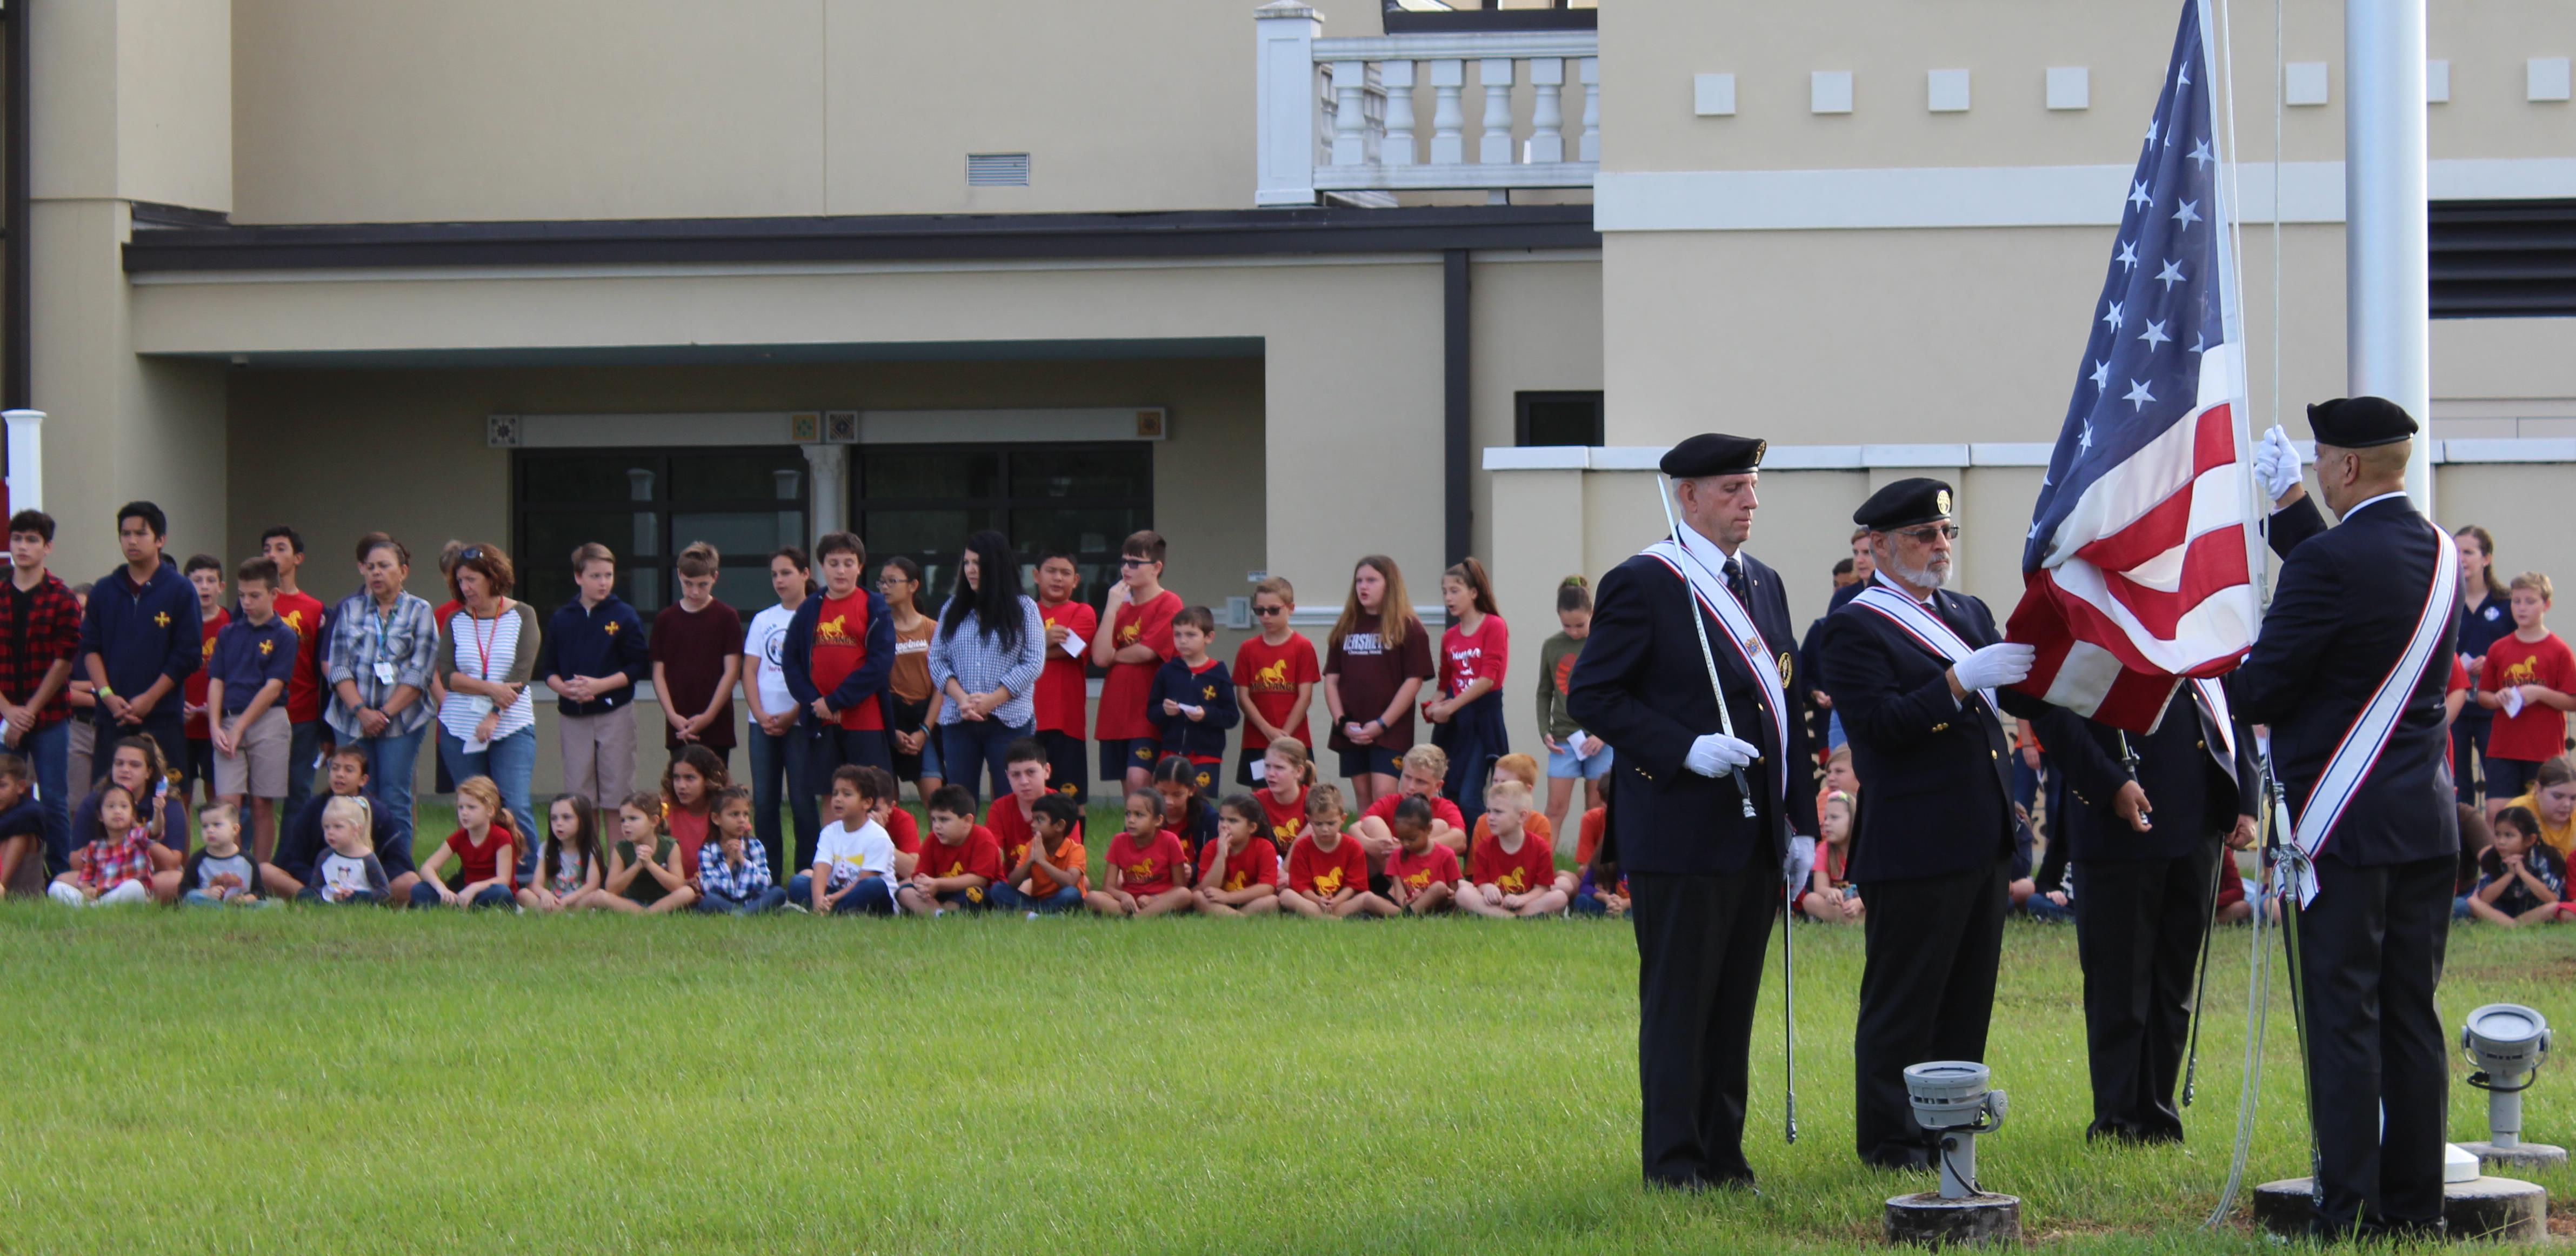 Veterans Day Flag Ceremony